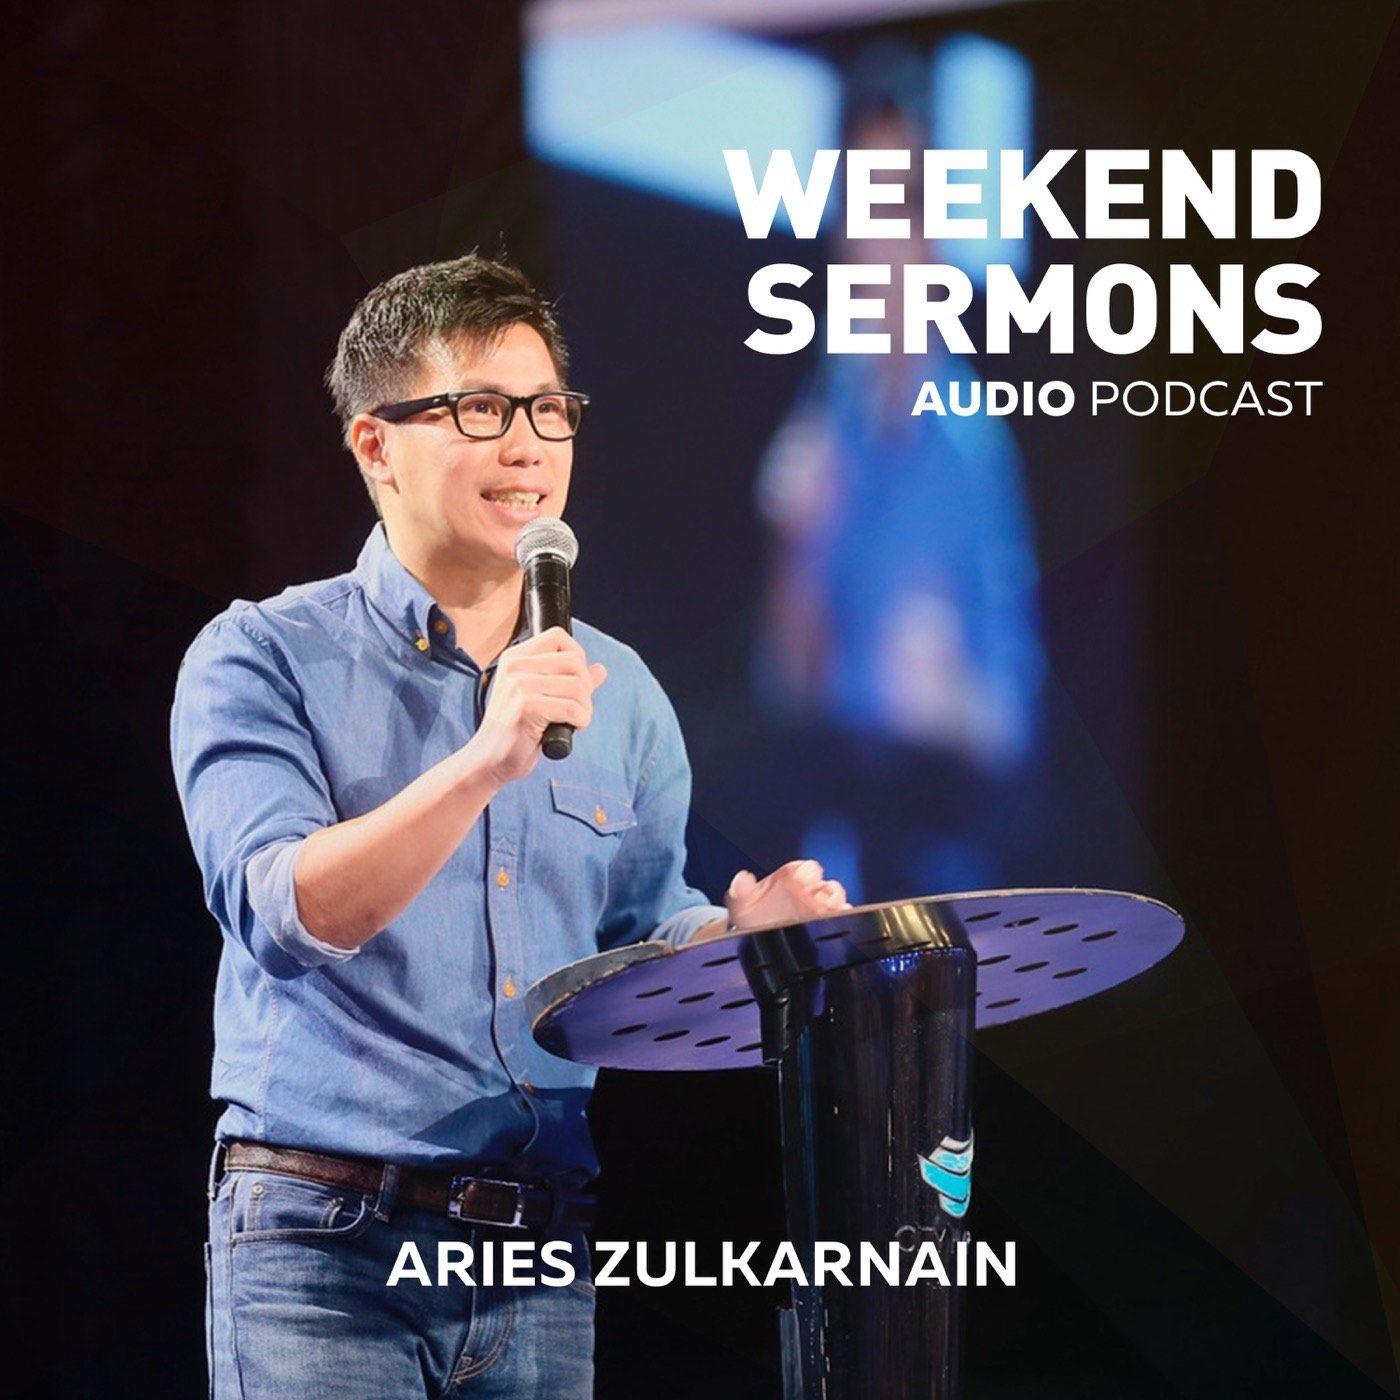 Aries Zulkarnain: Making Room For God – Selah